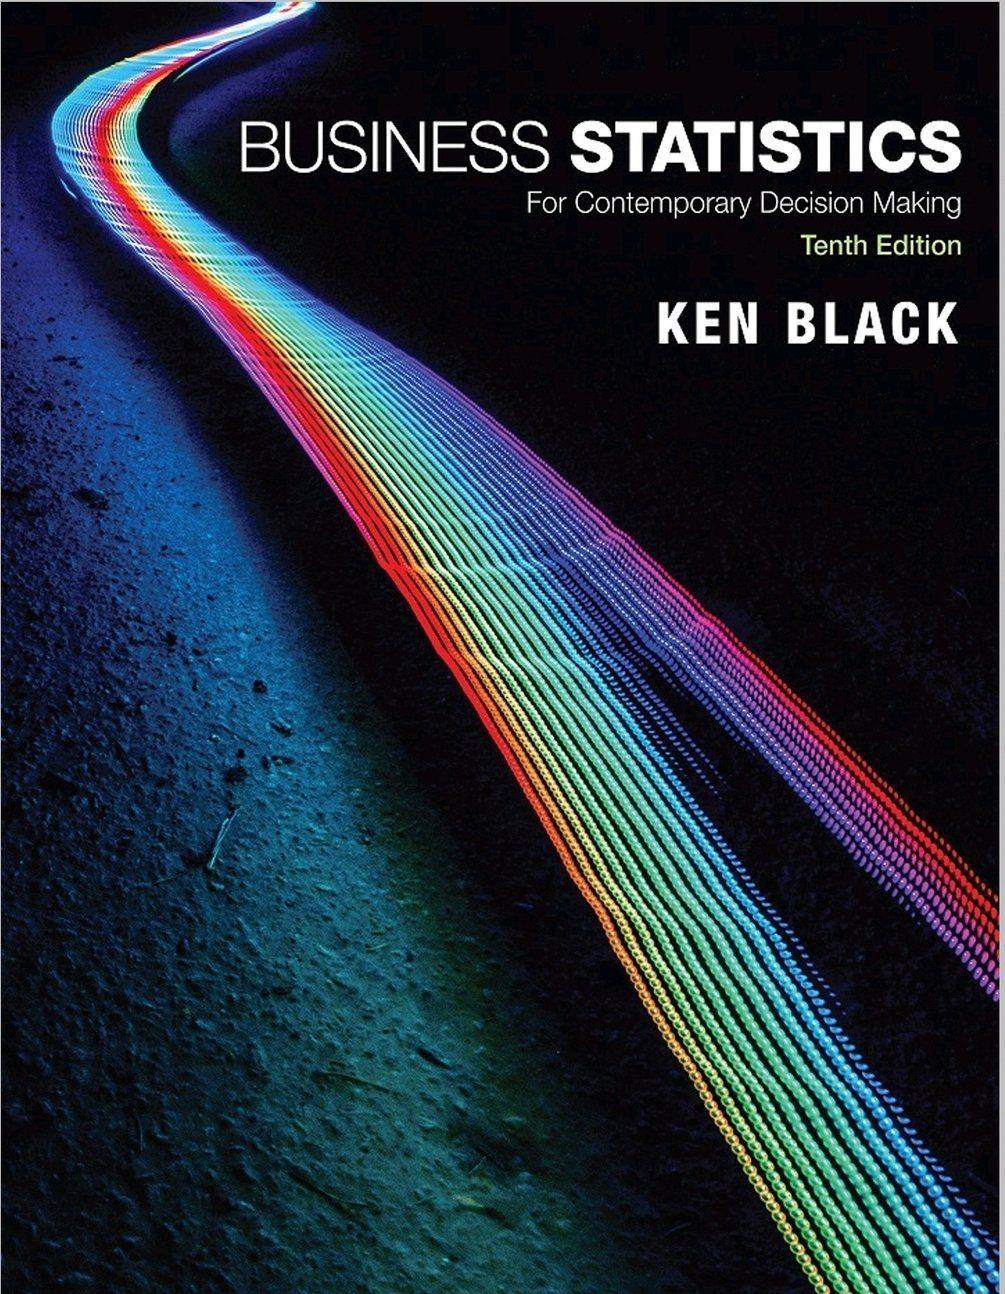 Business Statistics For Contemporary Decision Making 10th Edition In 2021 Business Statistics Decision Making Decision Making Skills